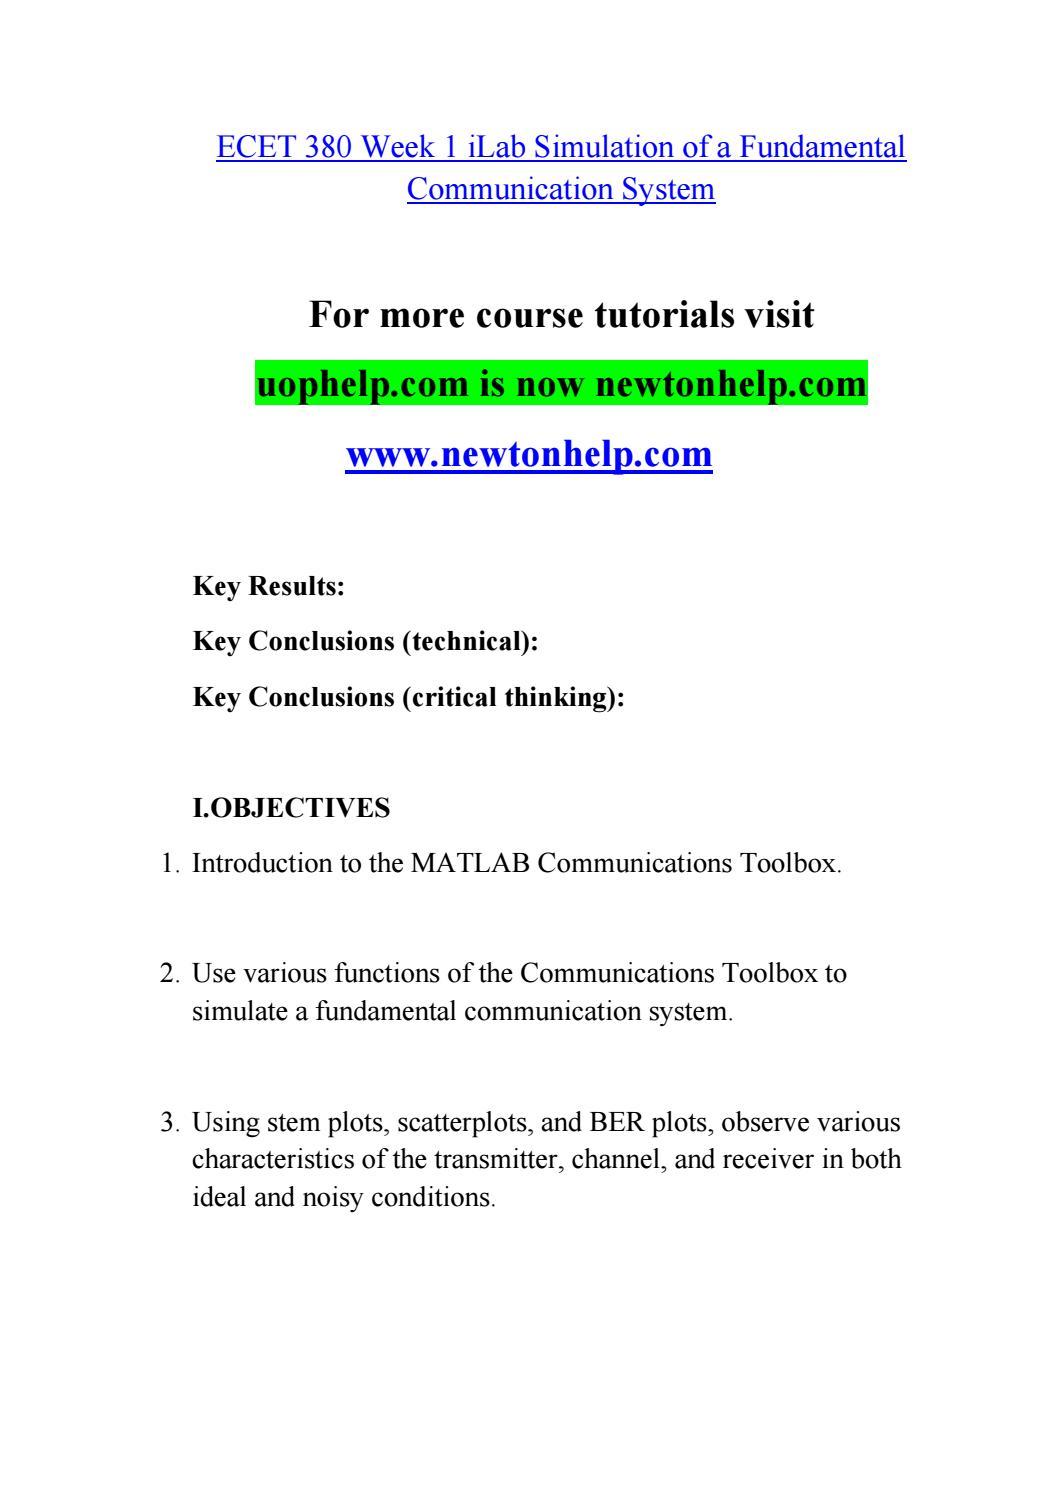 ECET 380 Seek Your Dream /newtonhelp com by thin kmorewo